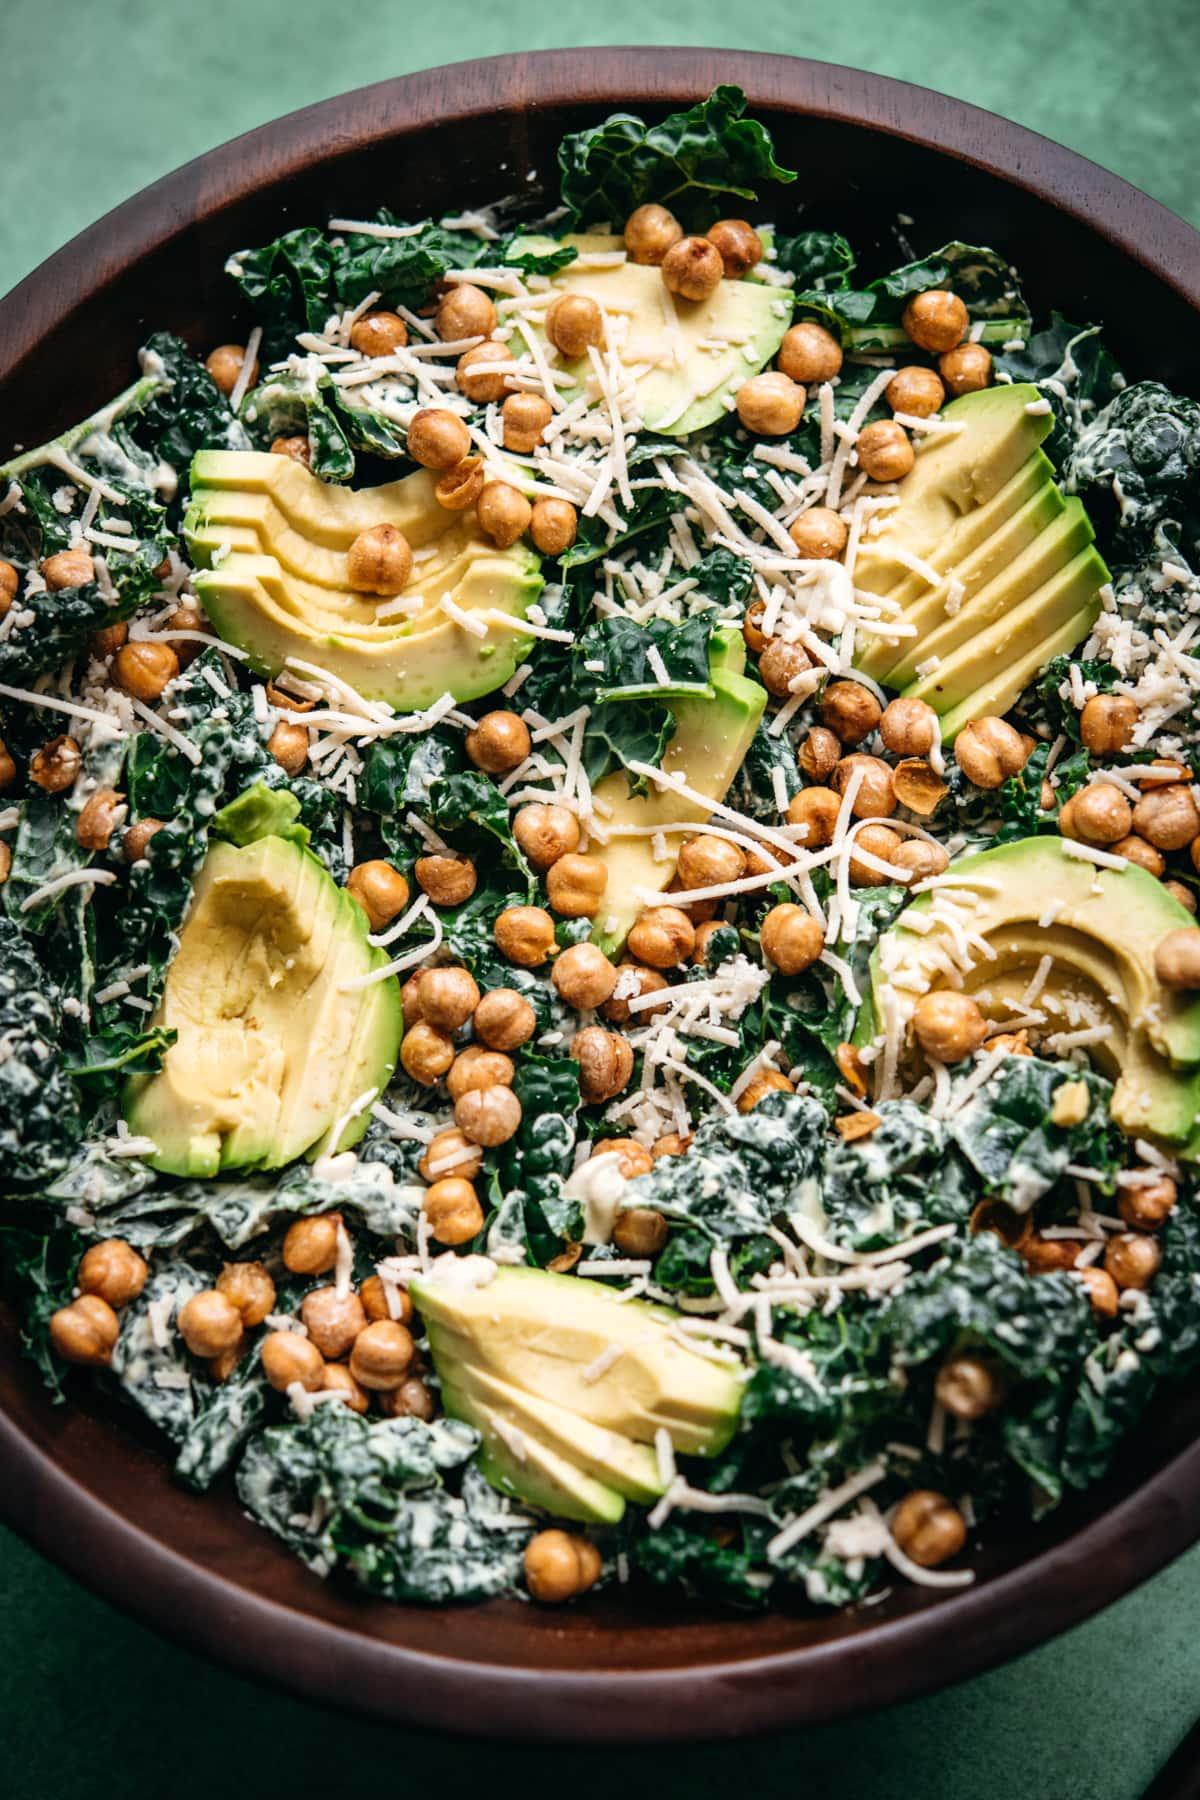 close up view of vegan kale tahini caesar salad with chickpeas.